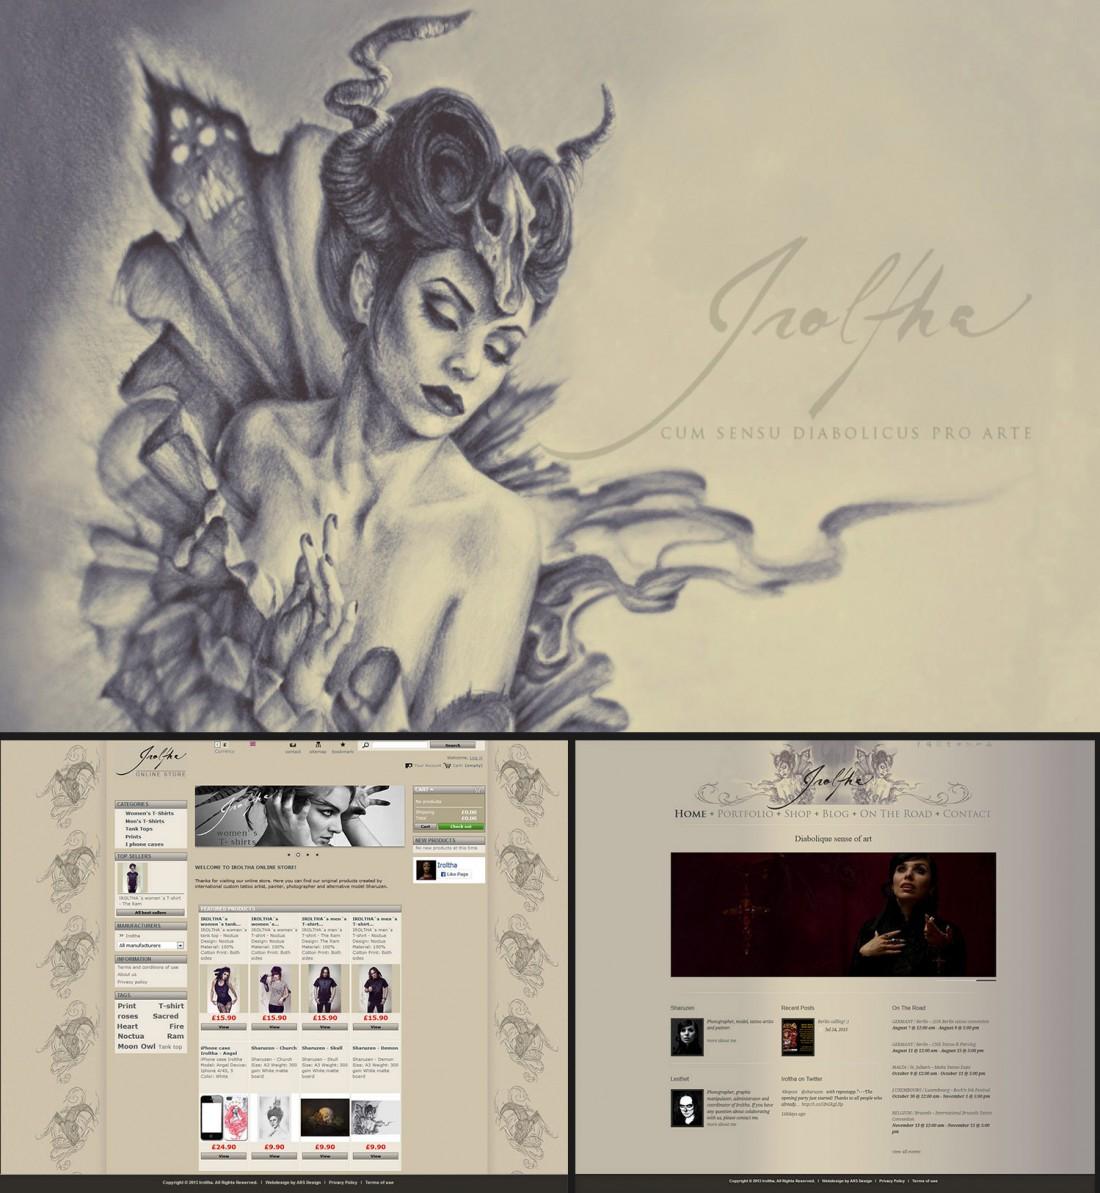 Iroltha webdesign 2015